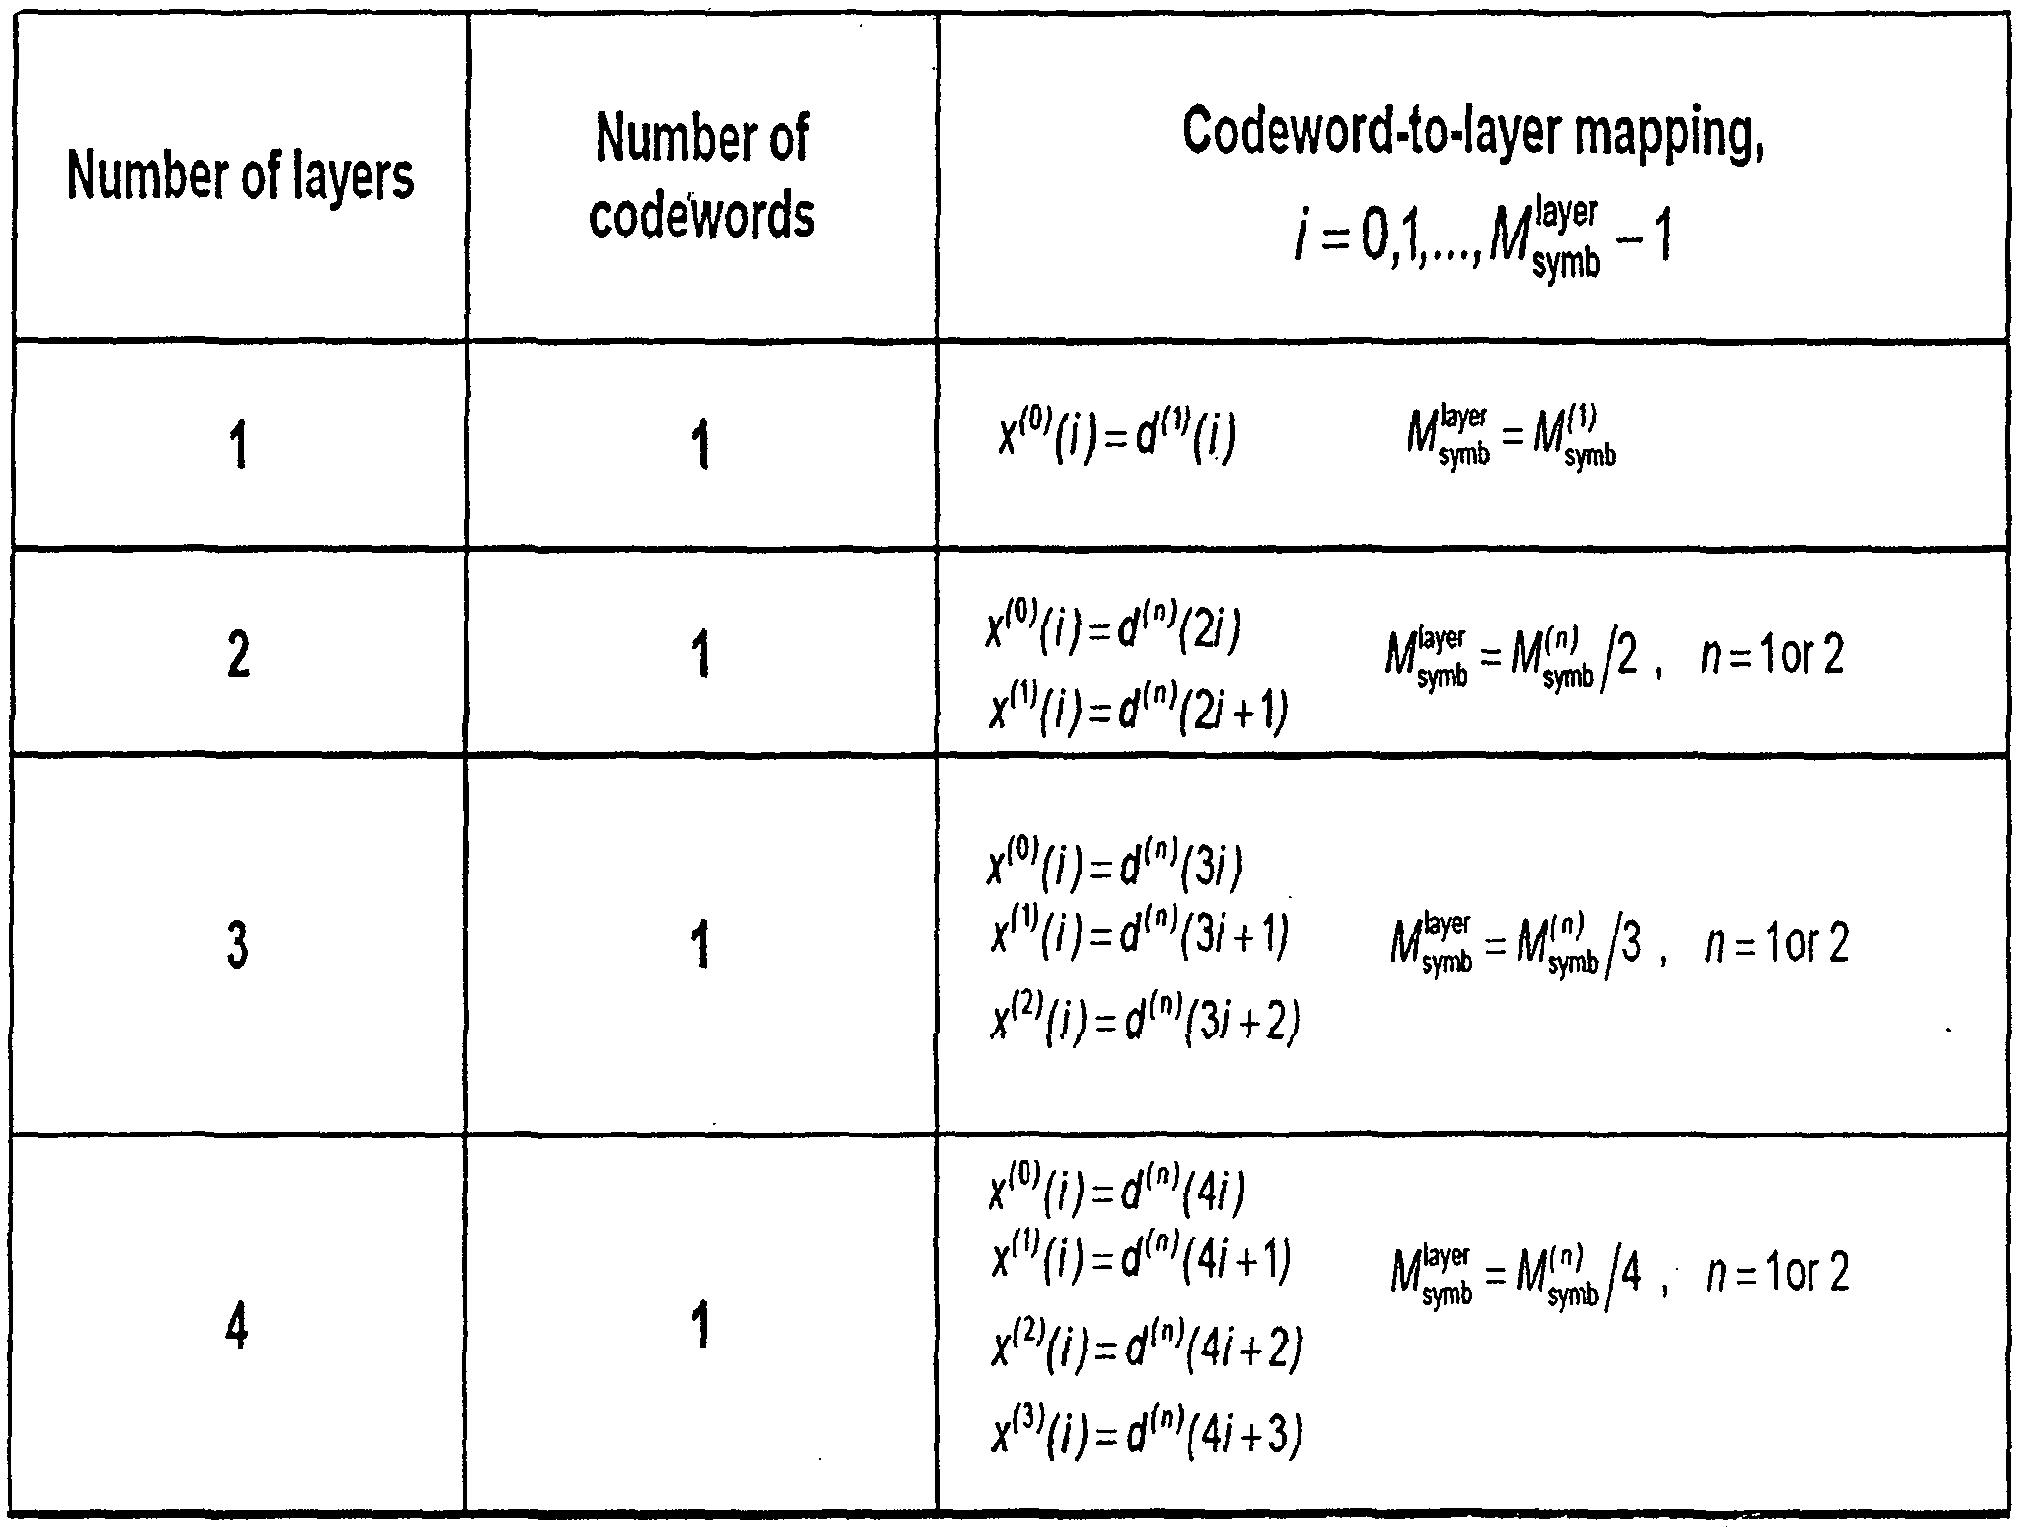 Figure WO-DOC-TABLE-43